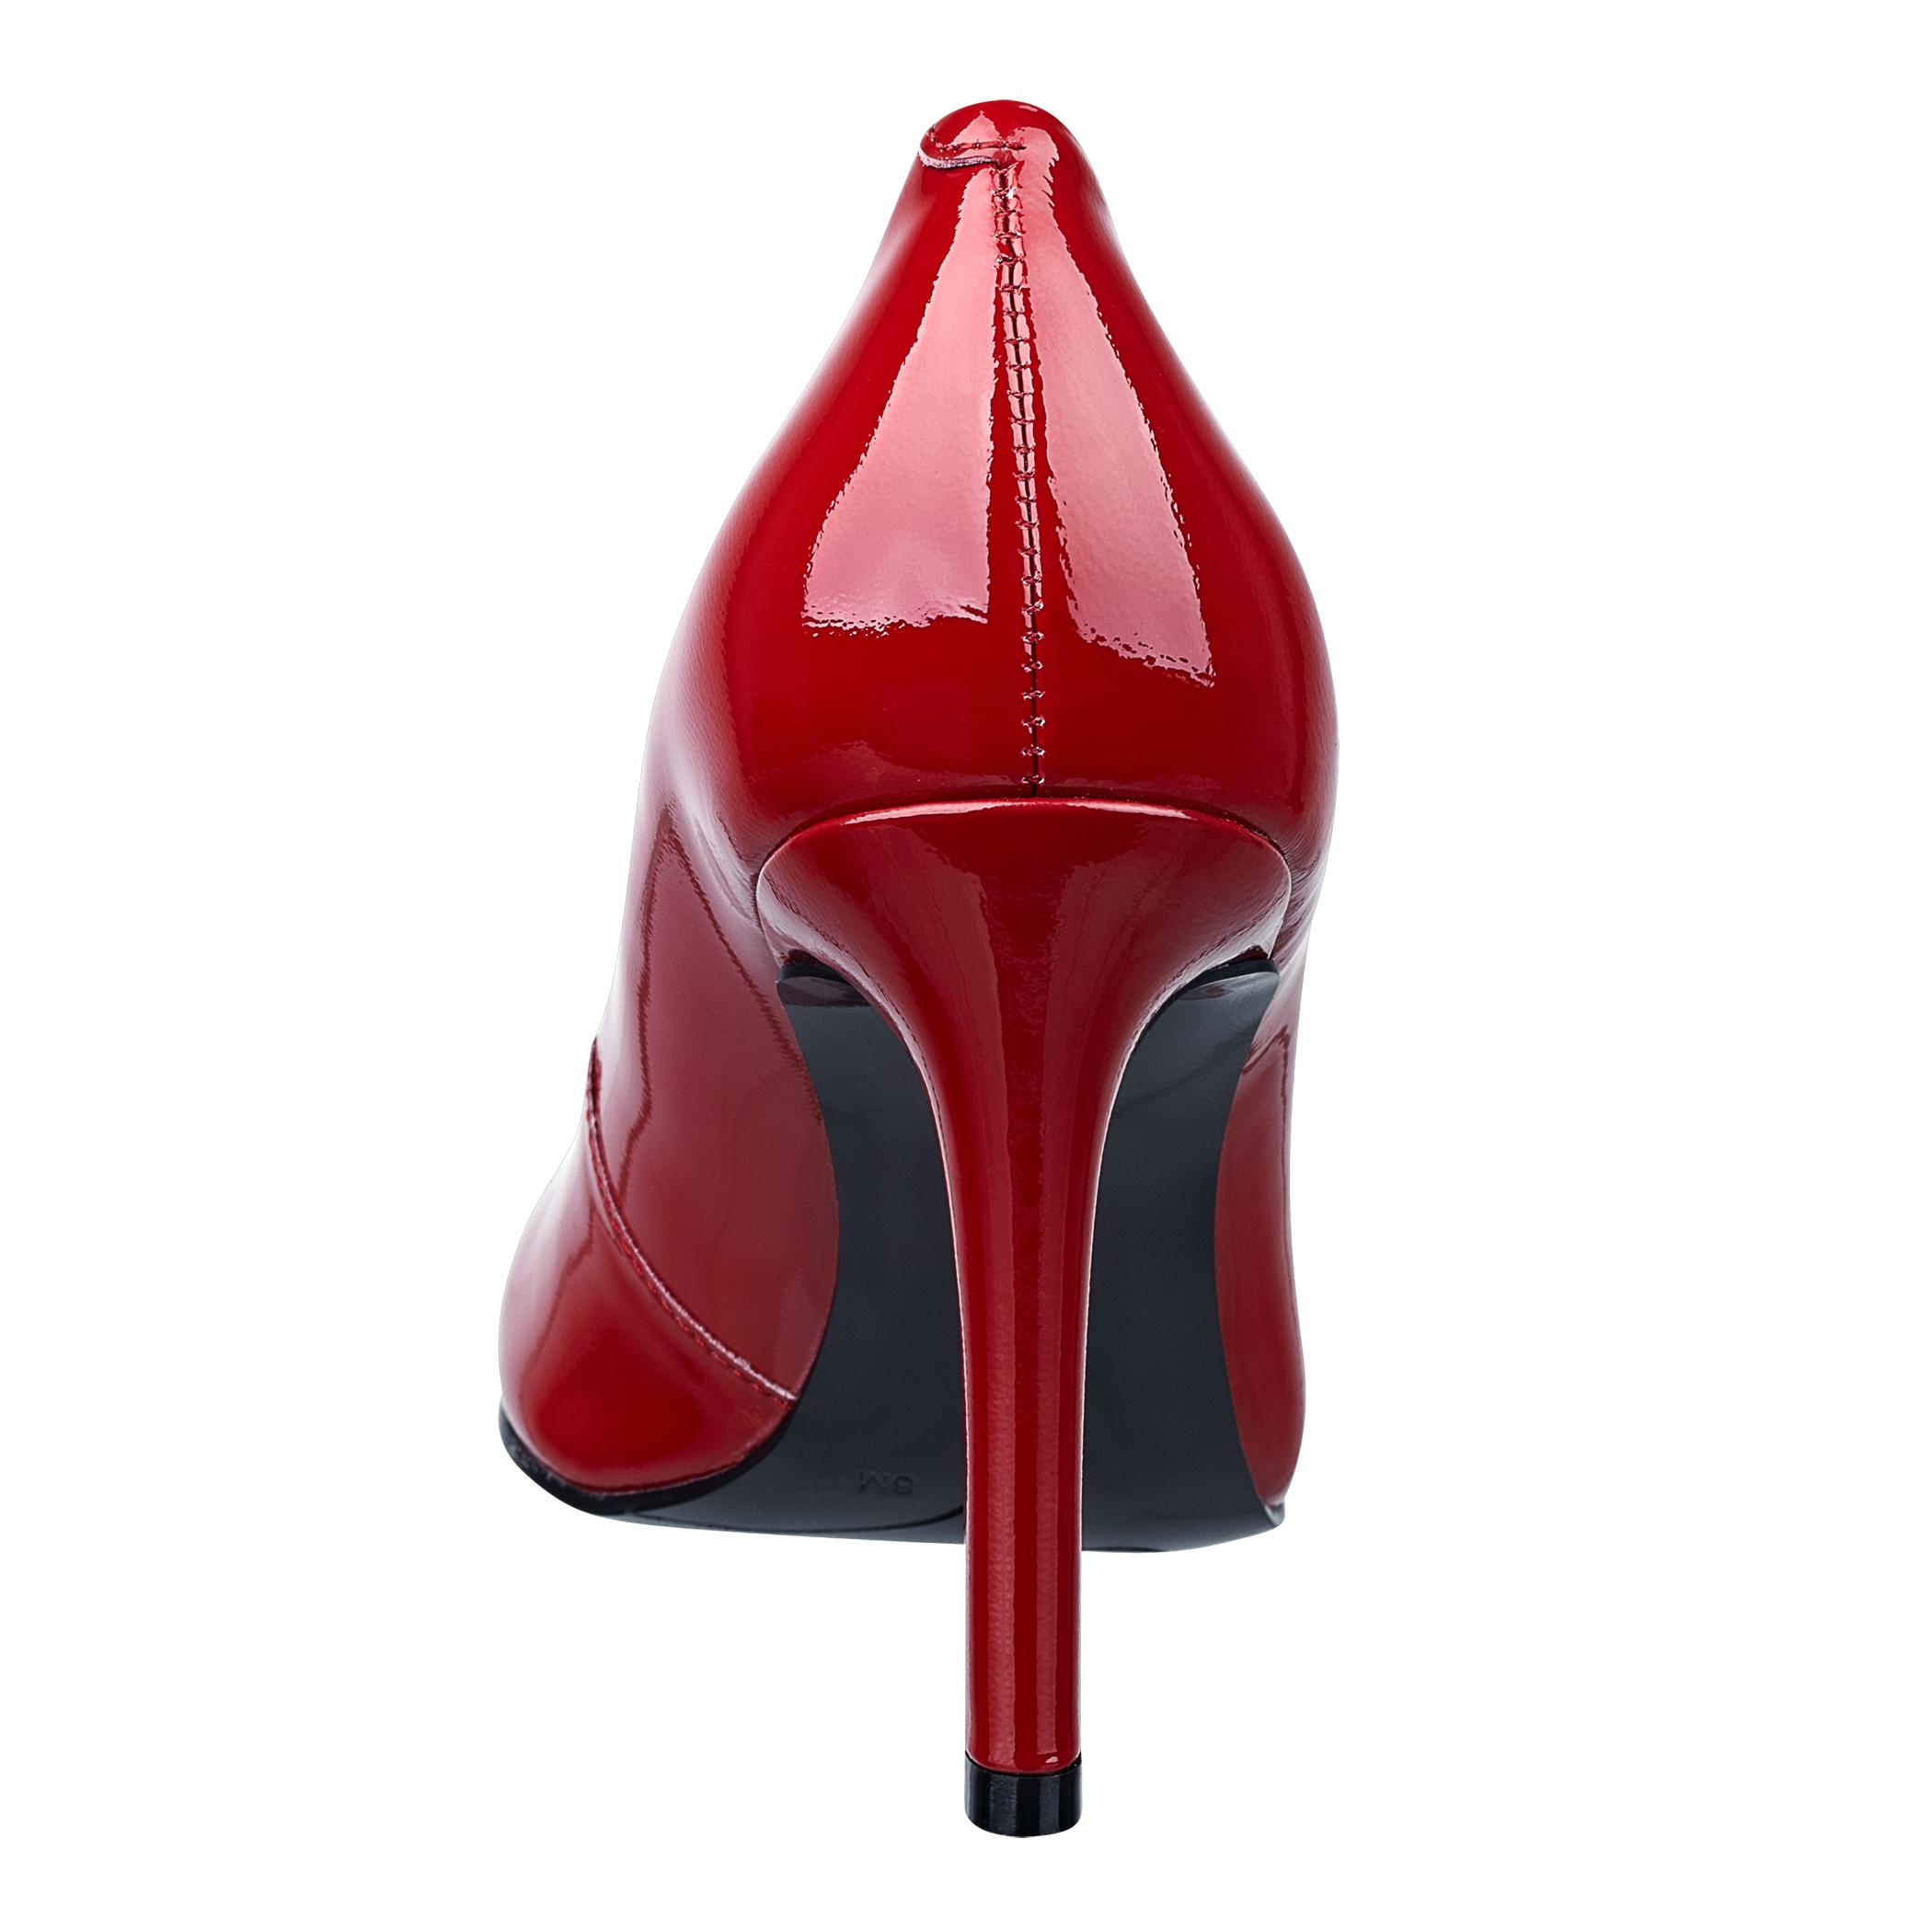 7fffa405c Nine West Caress Round Toe Pump in Red - Lyst